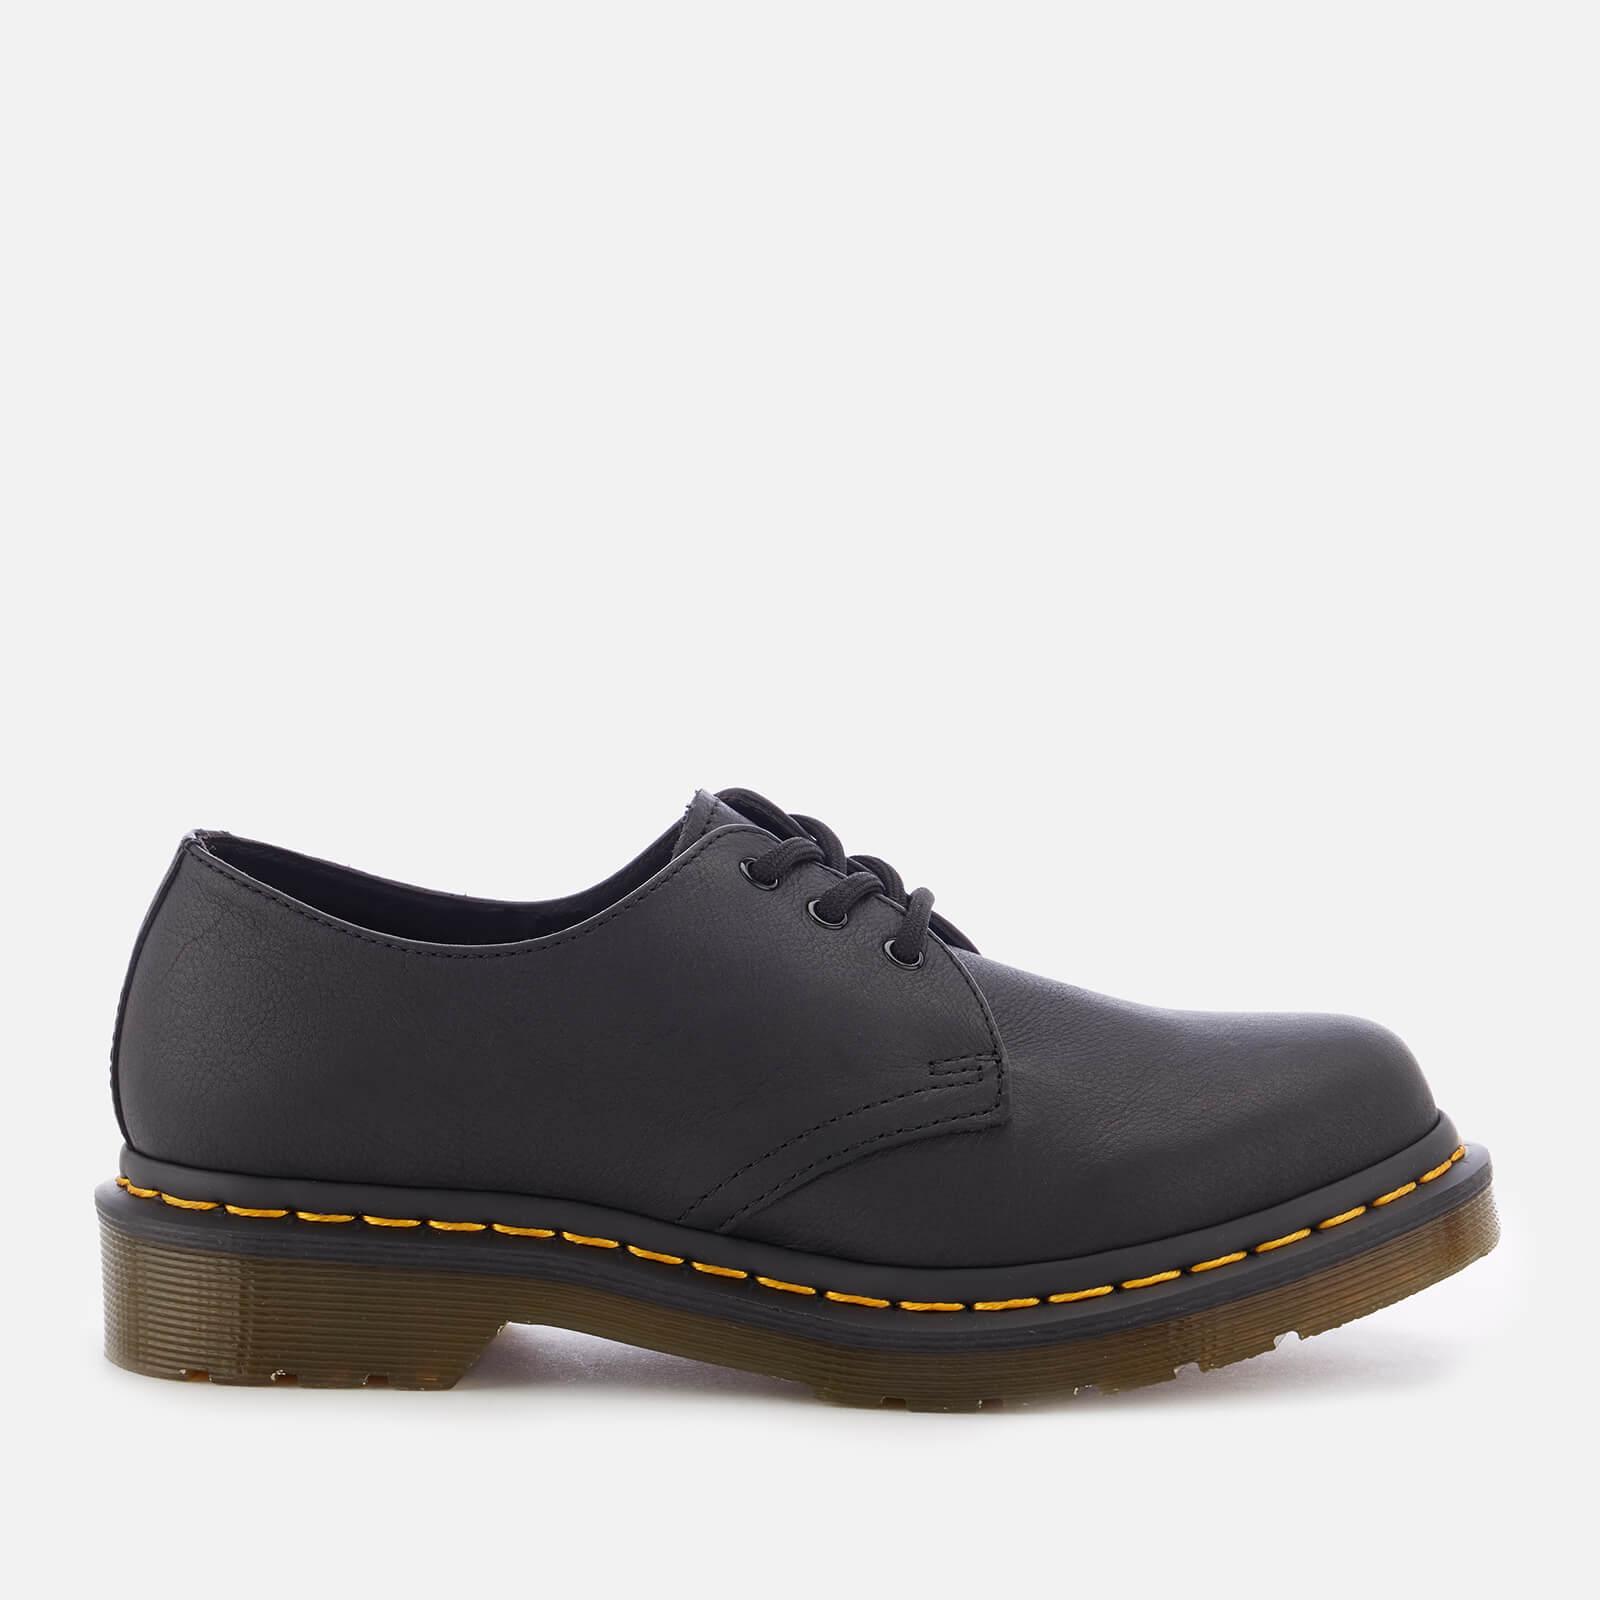 Dr. Martens Women's 1461 W Virginia Leather 3-Eye Shoes - Black - UK 6 - Black